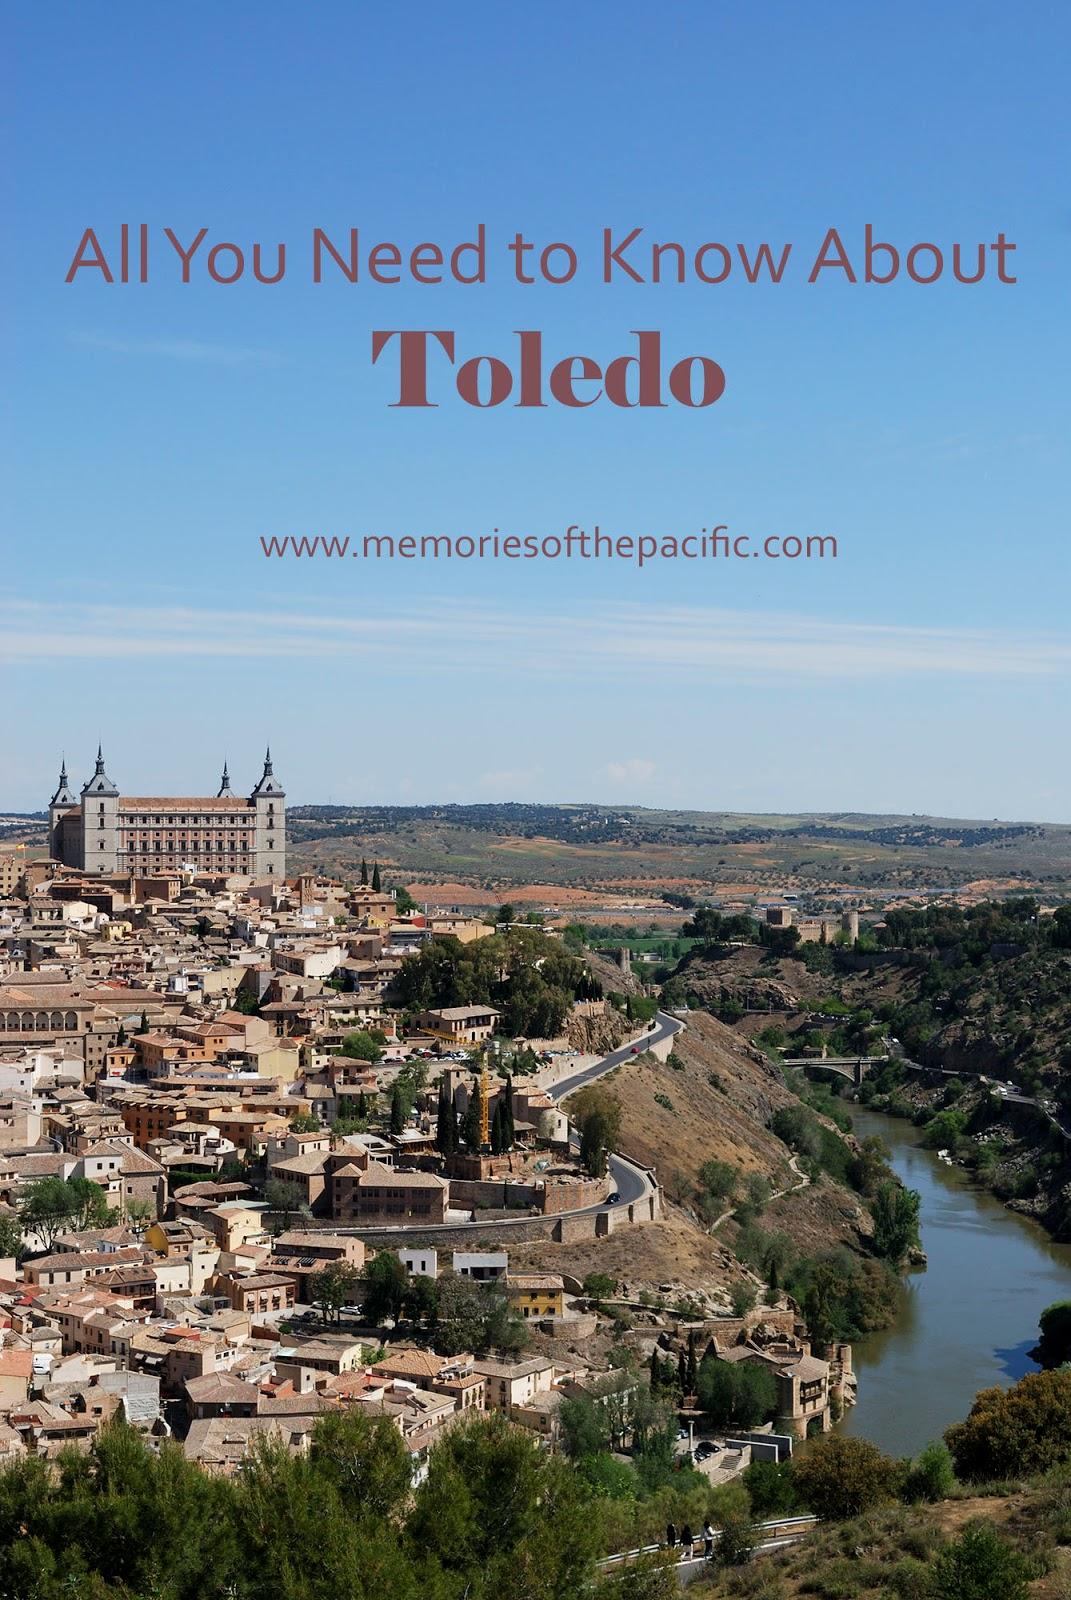 views vantage point mirado toledo spain landmark history travel guide tourism day trip itinerary